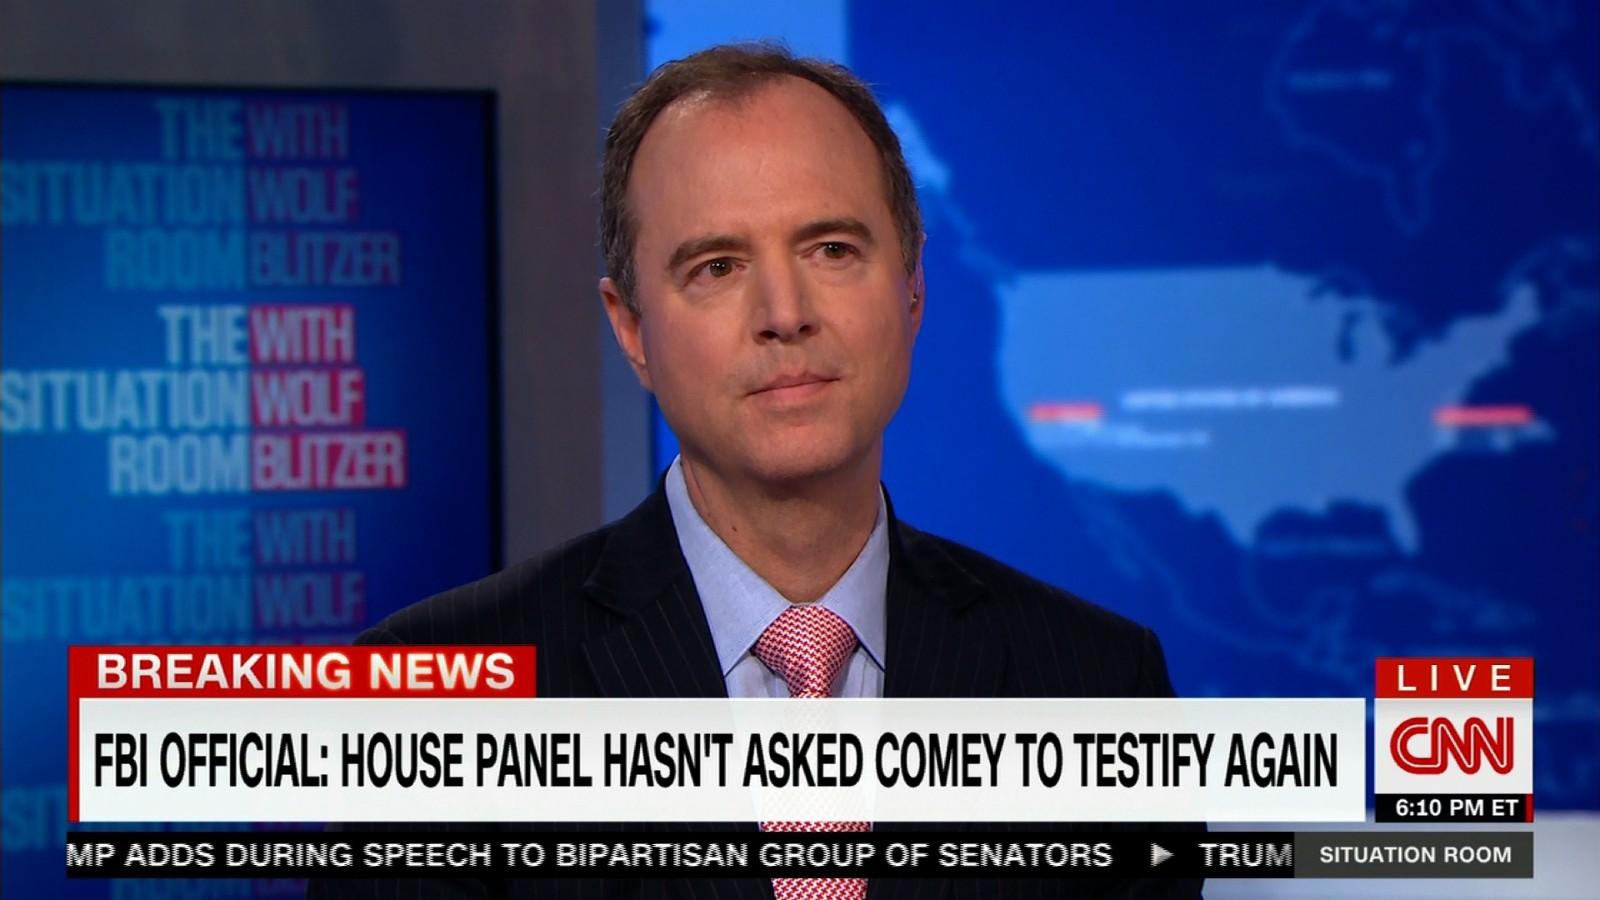 Schiff Says He Will Meet With Nunes On Thursday   CNNPolitics